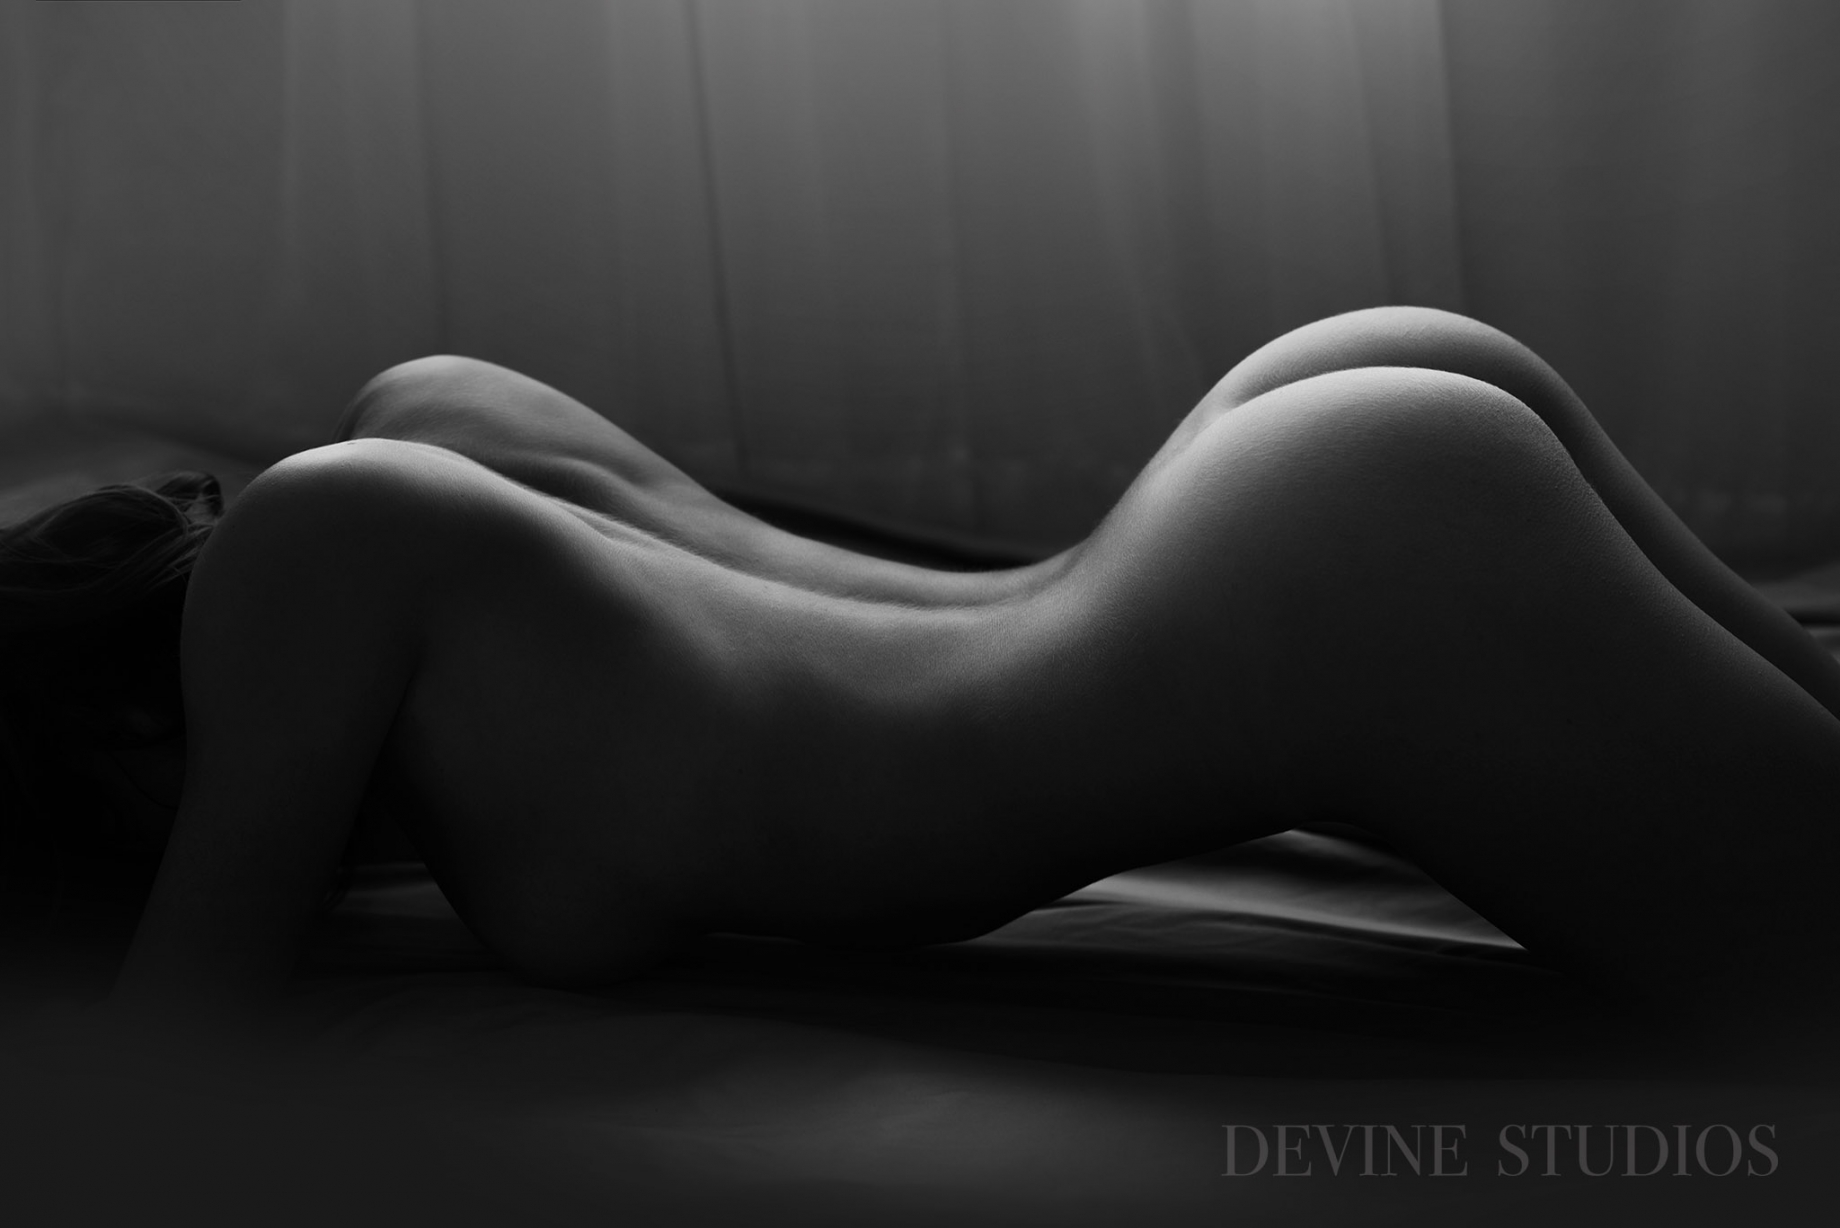 http://devinestudios.com/boudoir/wp-content/uploads/2016/11/Best-boudoir-kansas-city-missouri-photographer-5(pp_w1840_h1228).jpg